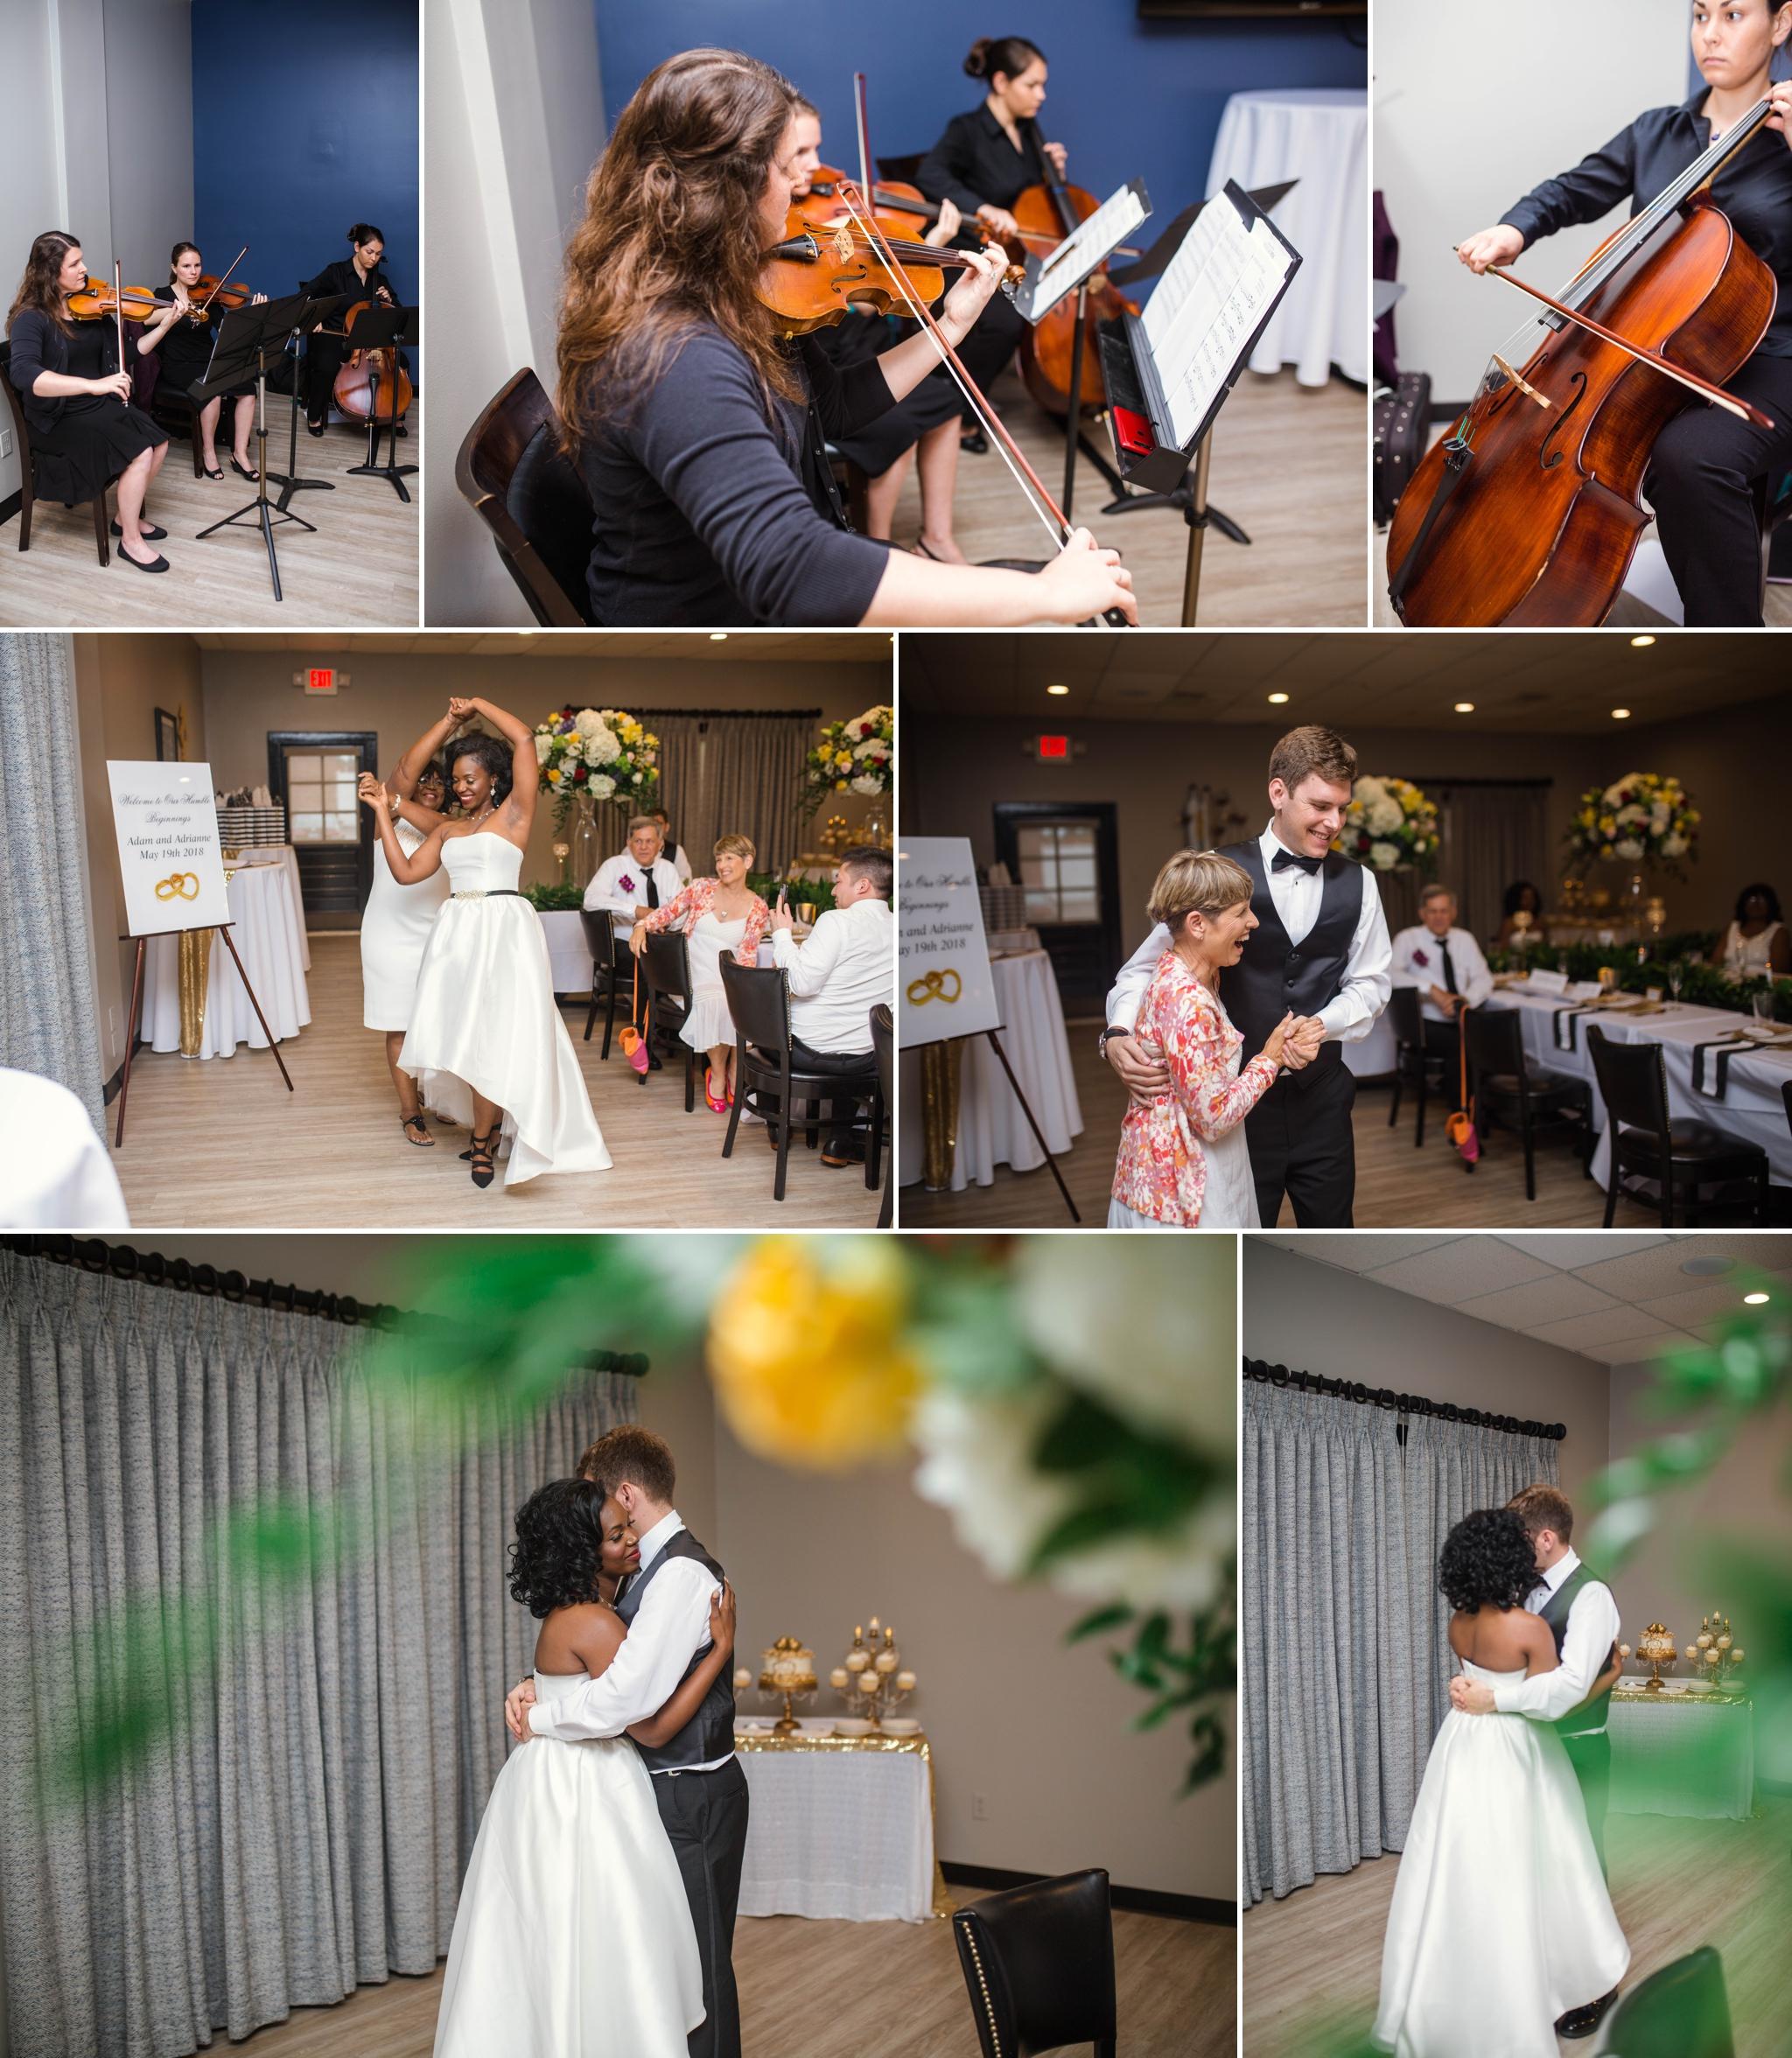 Military Wedding at Main Post Chapel in Fort Bragg, NC - Fayetteville North Carolina Wedding Photographer 14.jpg